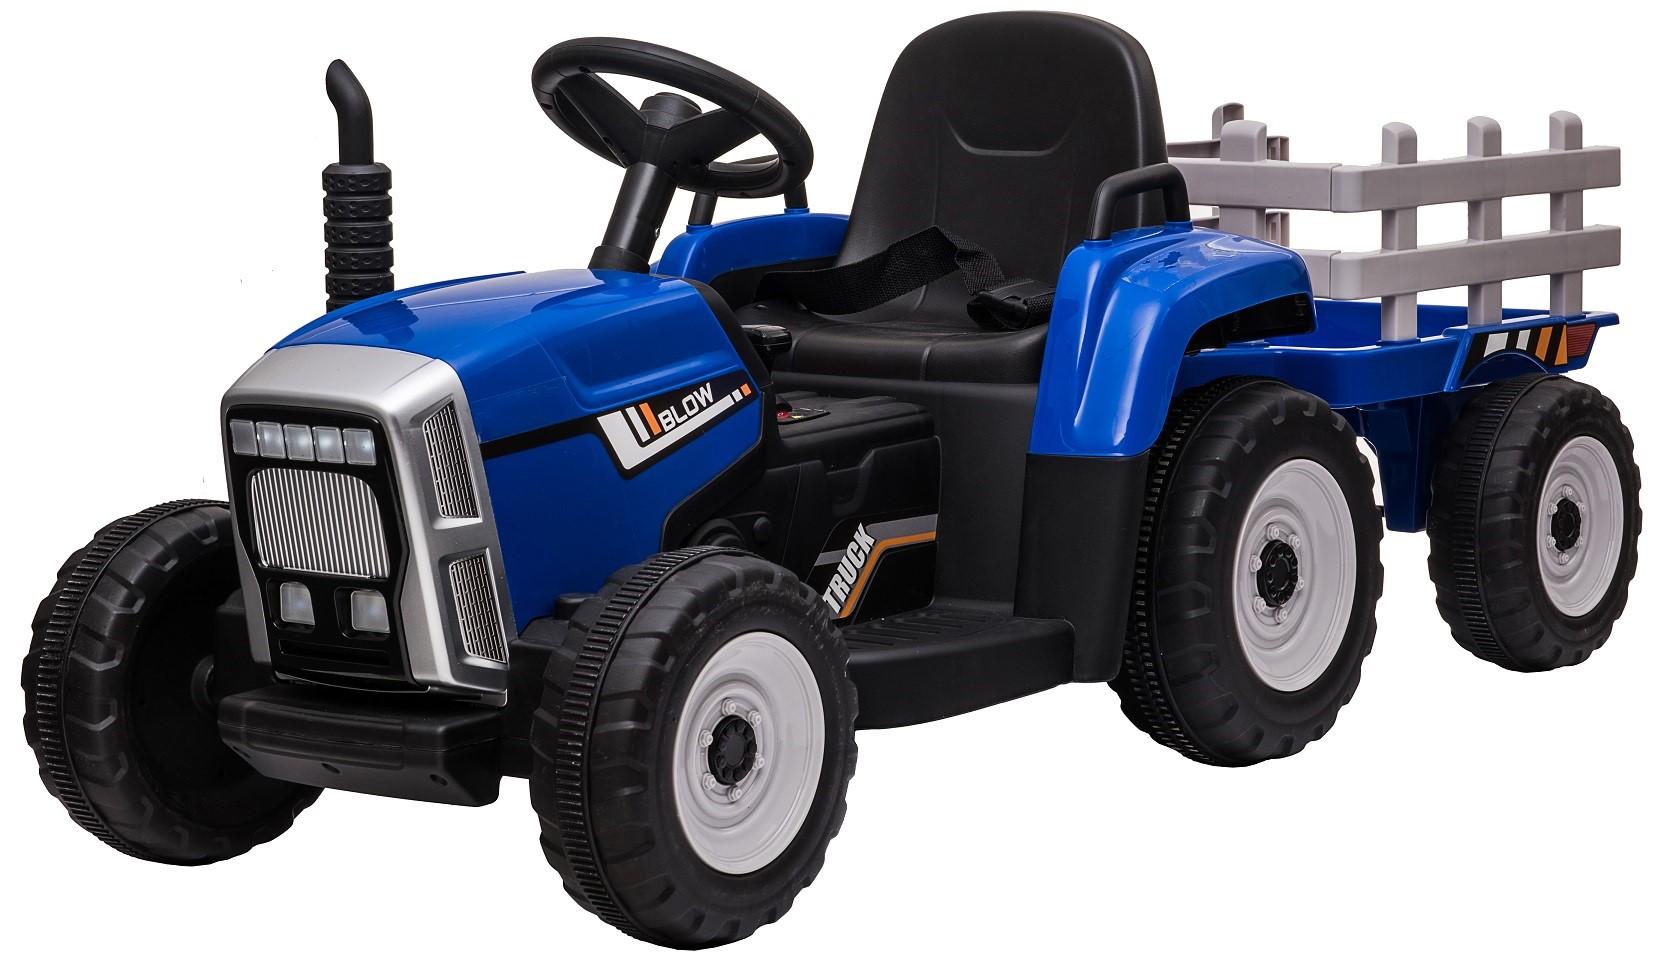 Tractor electric cu remorca Premier Farm, 12V, roti cauciuc EVA, albastru